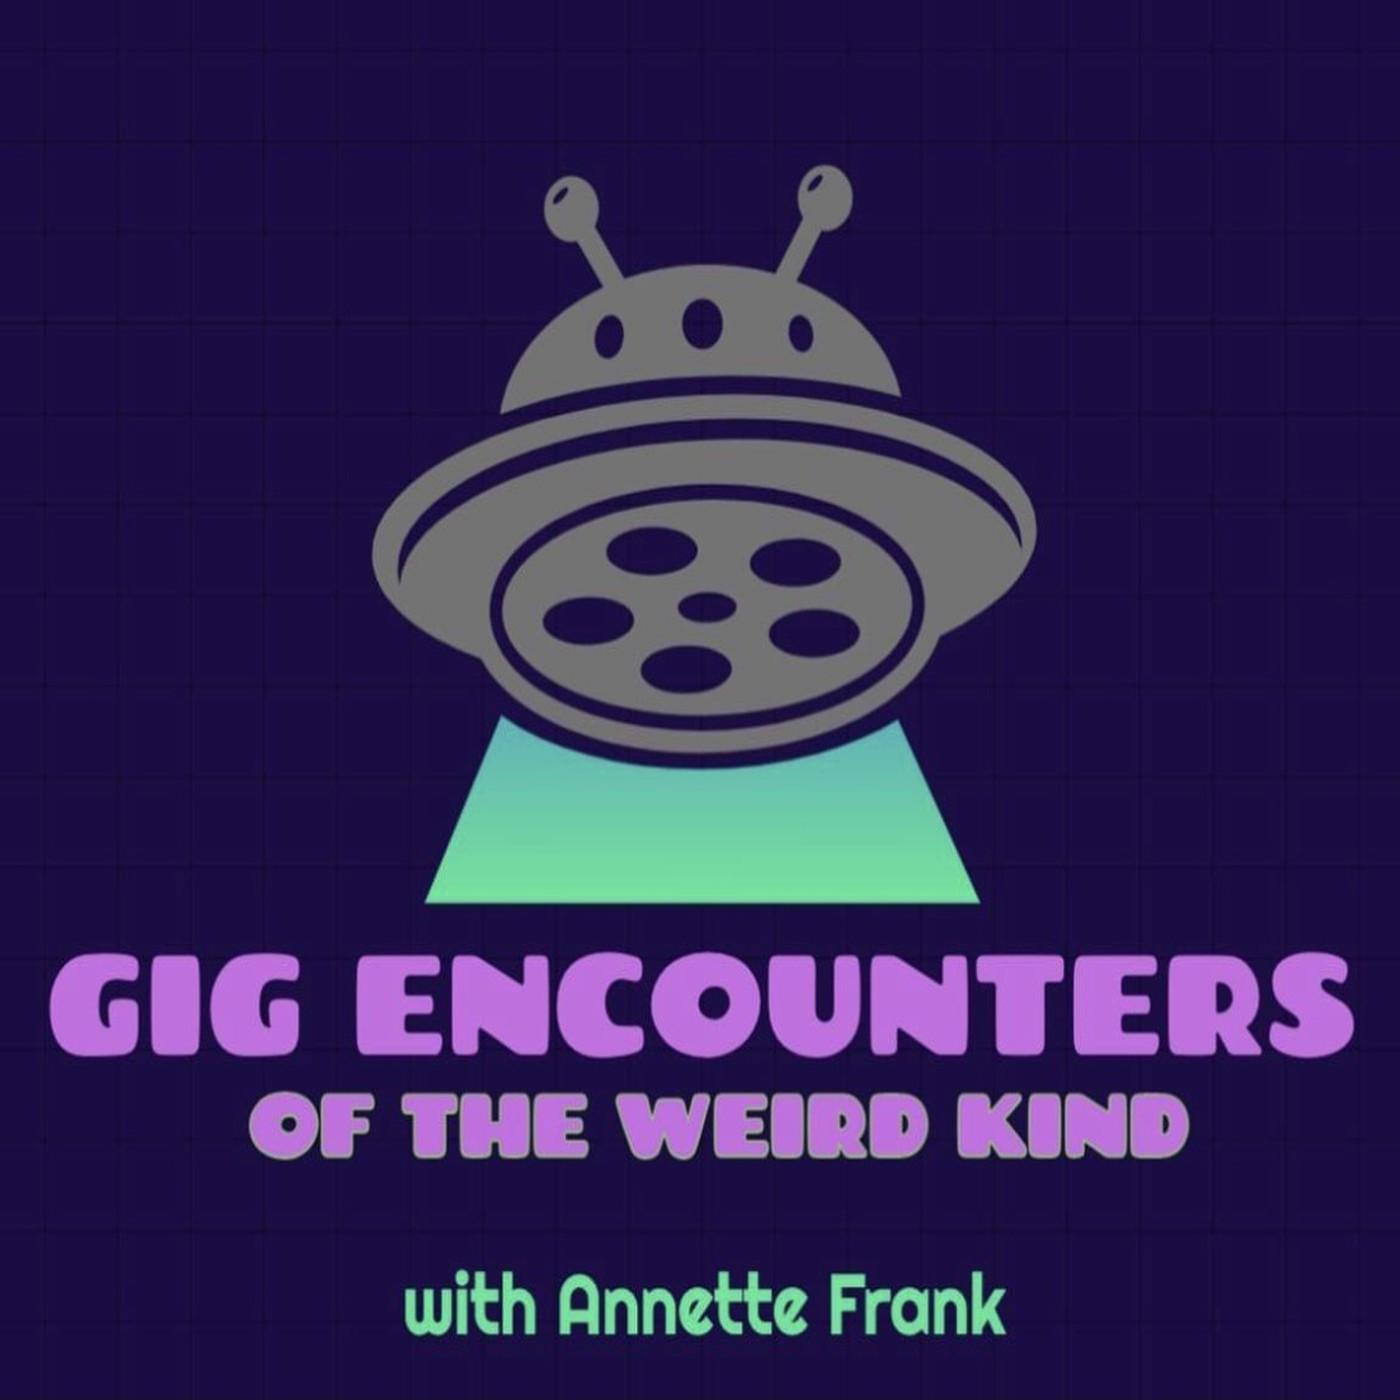 Gig Encounters of the weird kind.